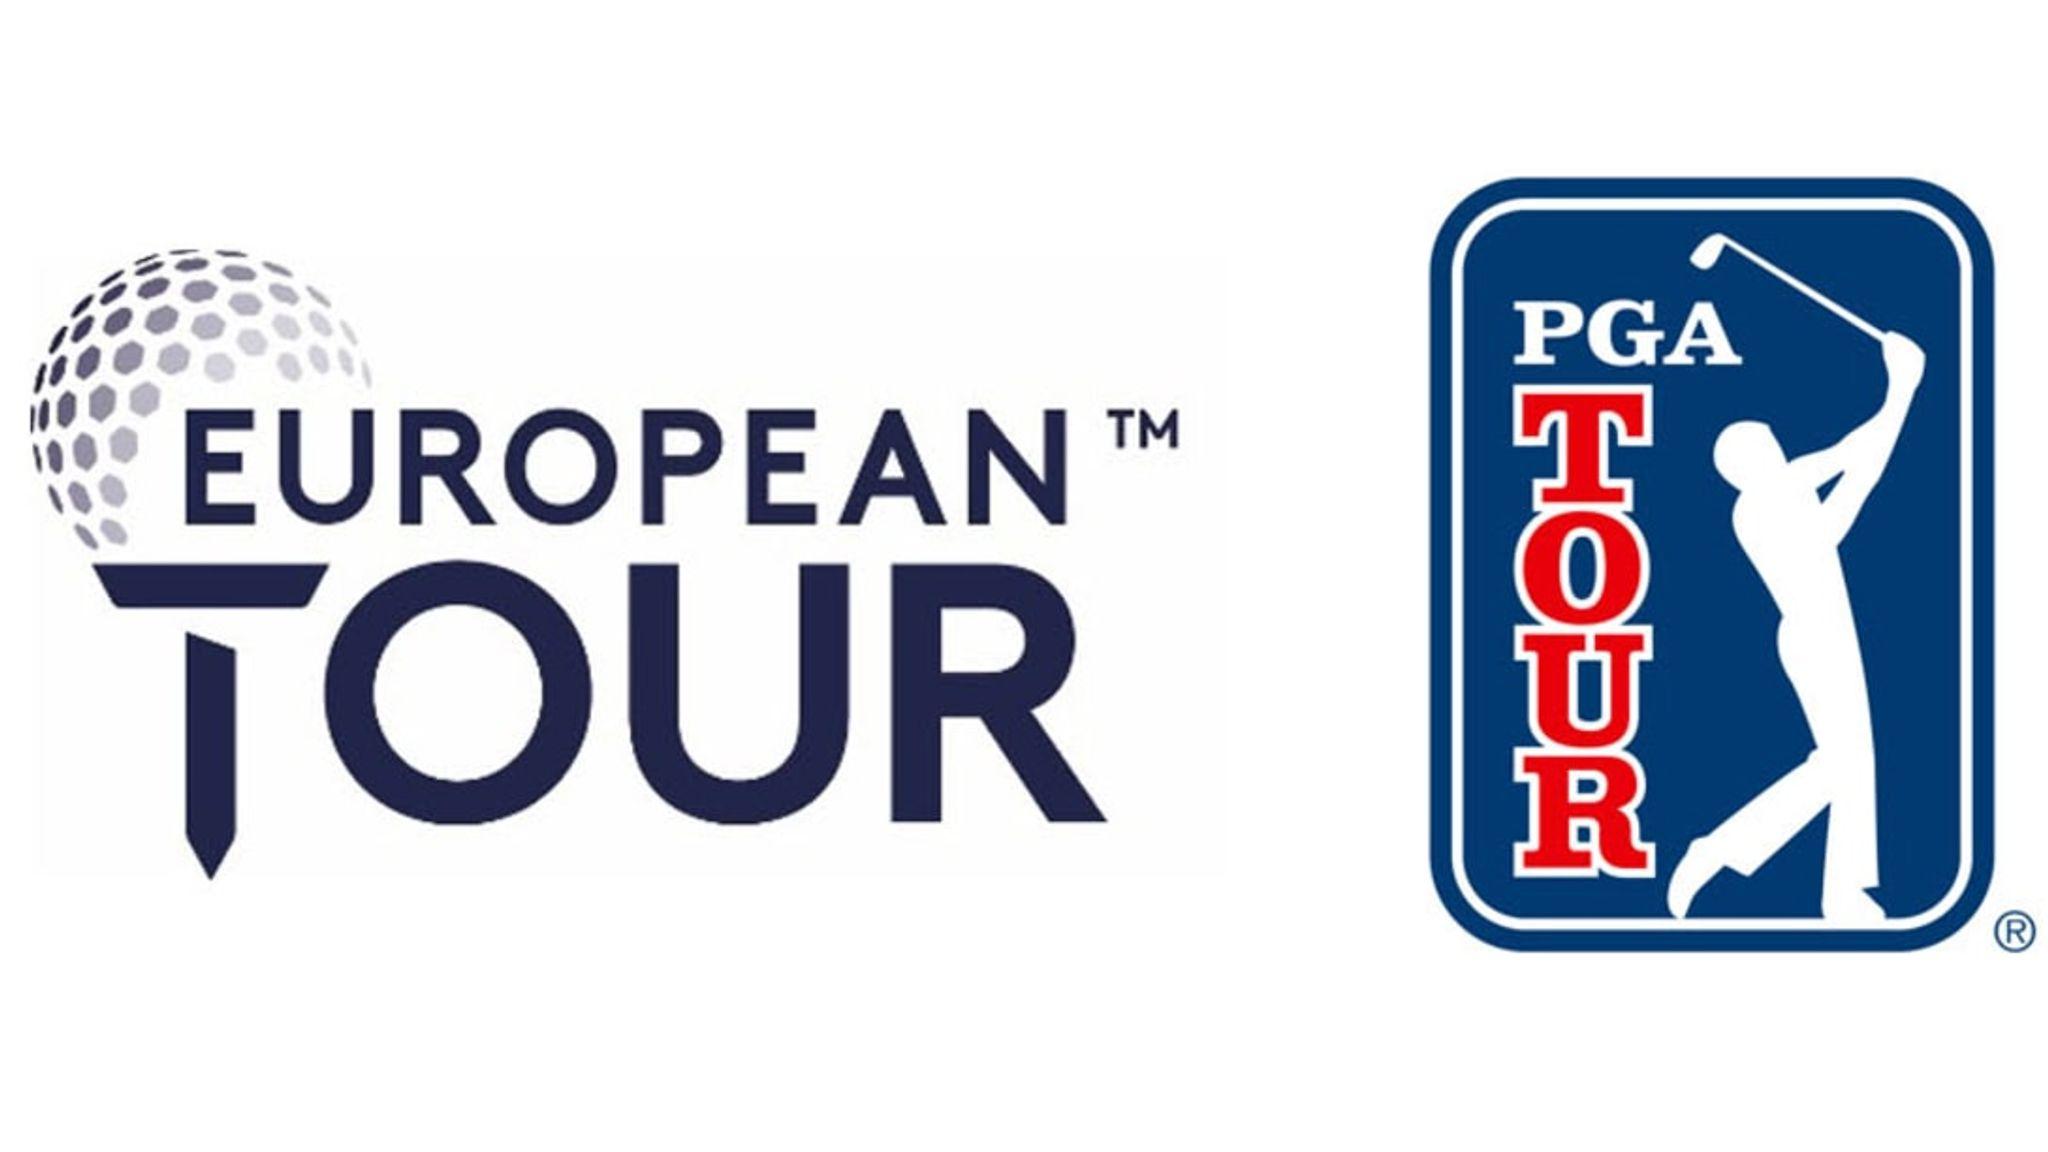 European Tour and PGA Tour announce new historic partnership | Golf News | Sky Sports